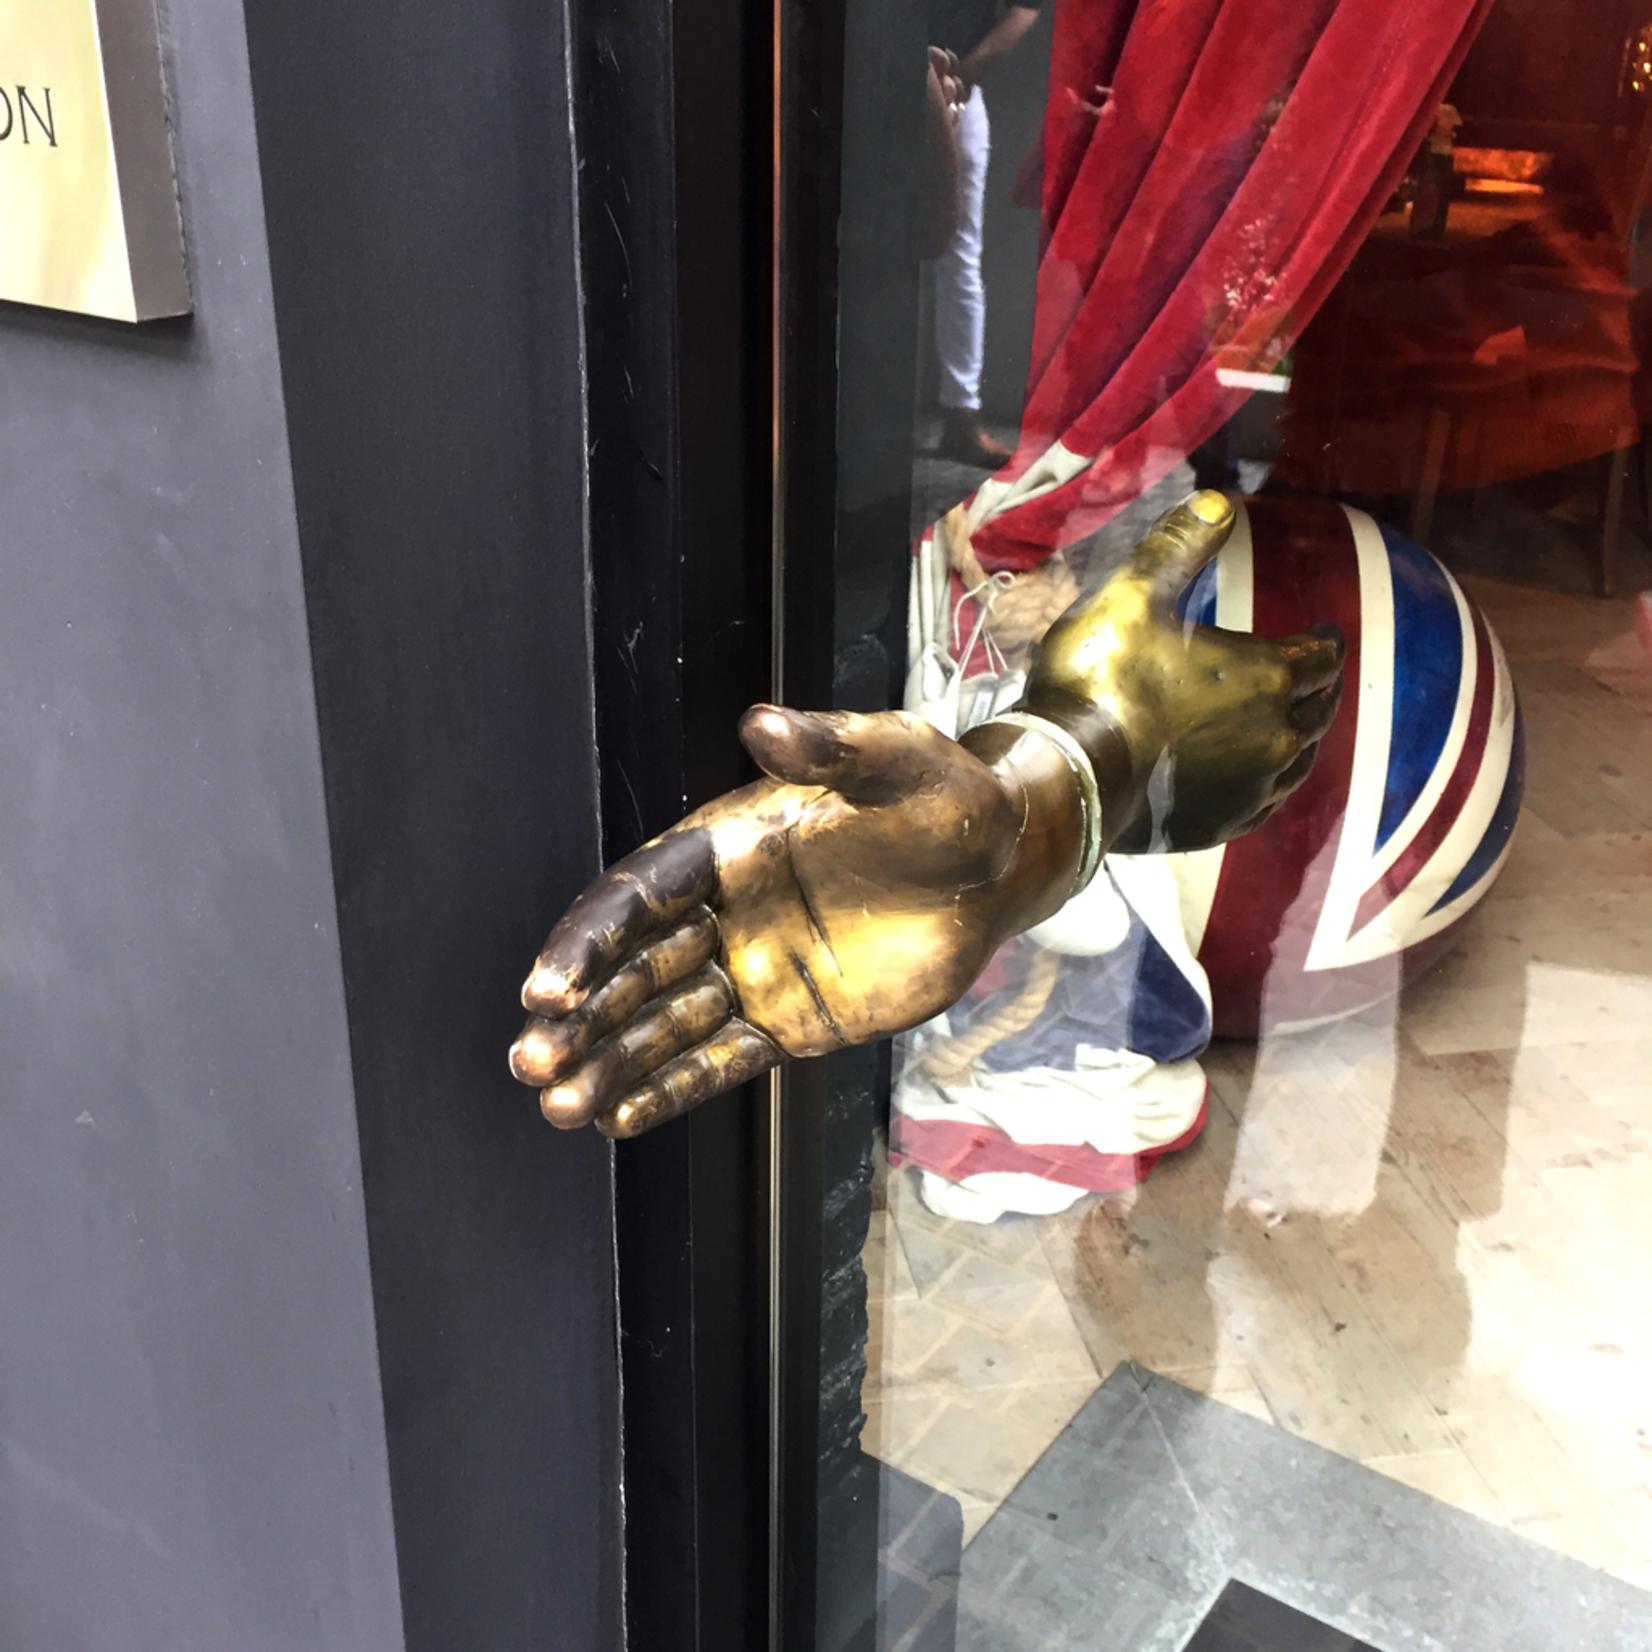 TIMOTHY OULTON TO LEFT HAND DOOR HANDLE